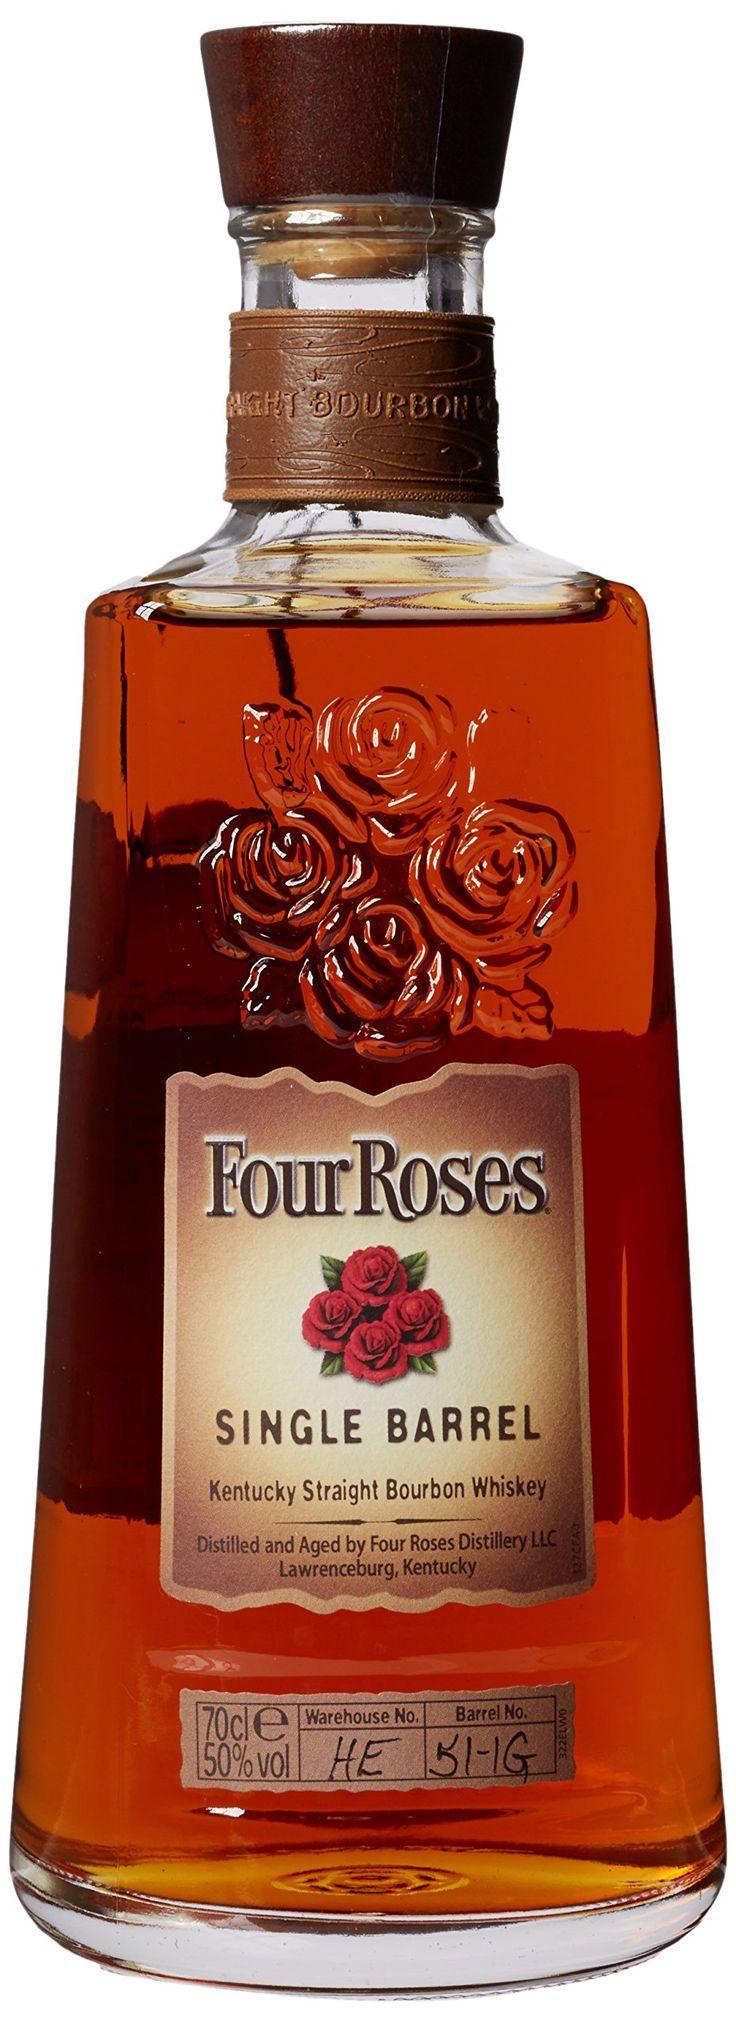 Four Roses Single Barrel Kentucky Straight Bourbon Whiskey 70 cl